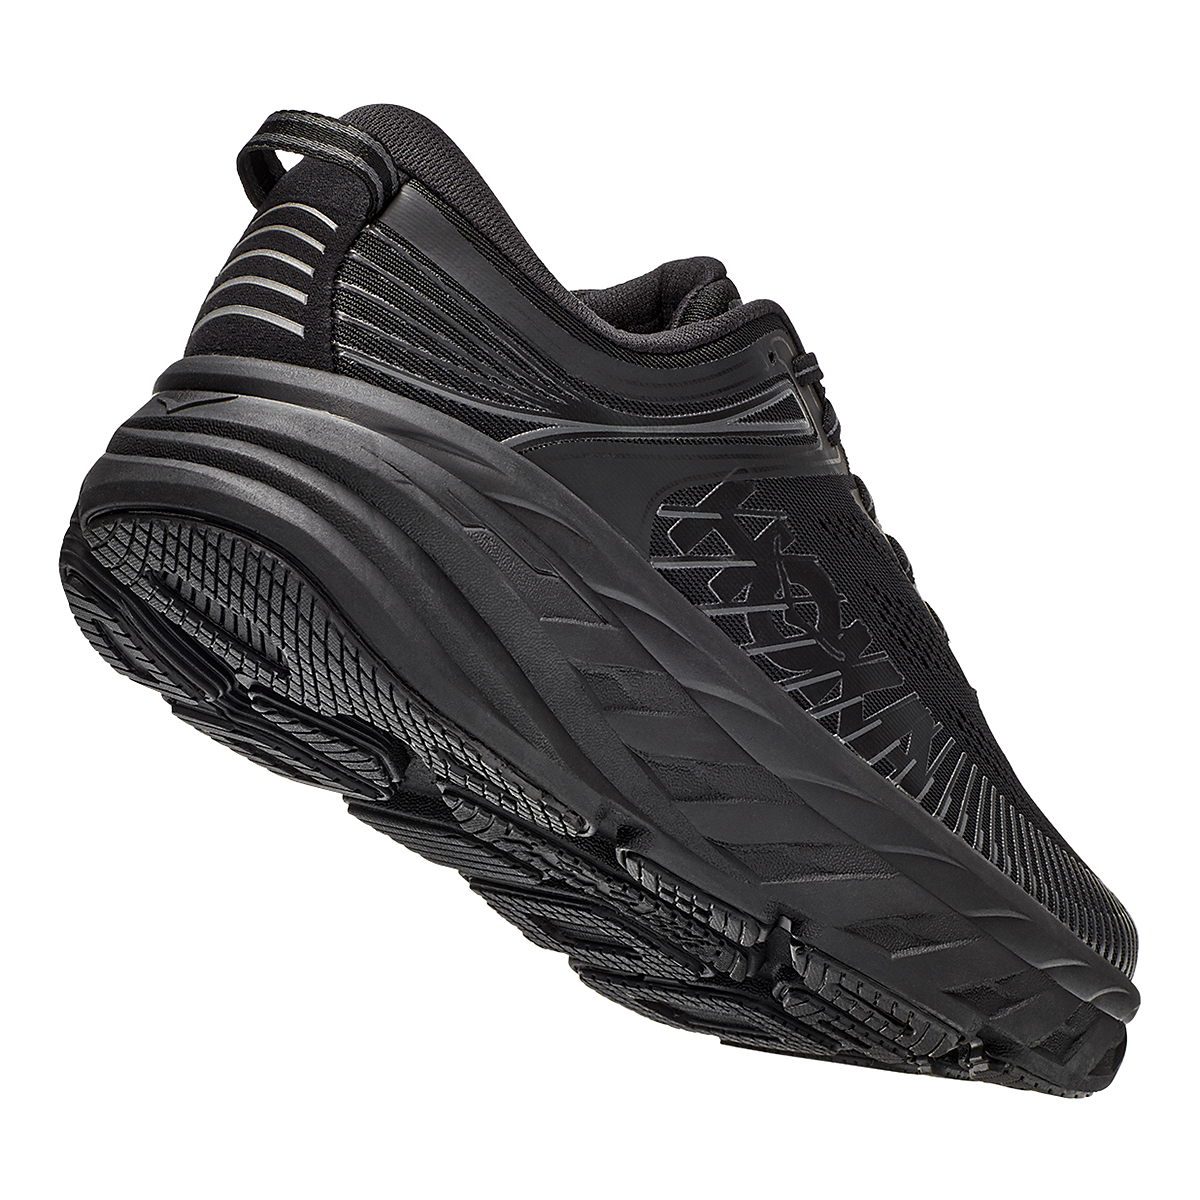 Men's Hoka One One Bondi 7 Running Shoe - Color: Black - Size: 7.5 - Width: Regular, Black, large, image 3